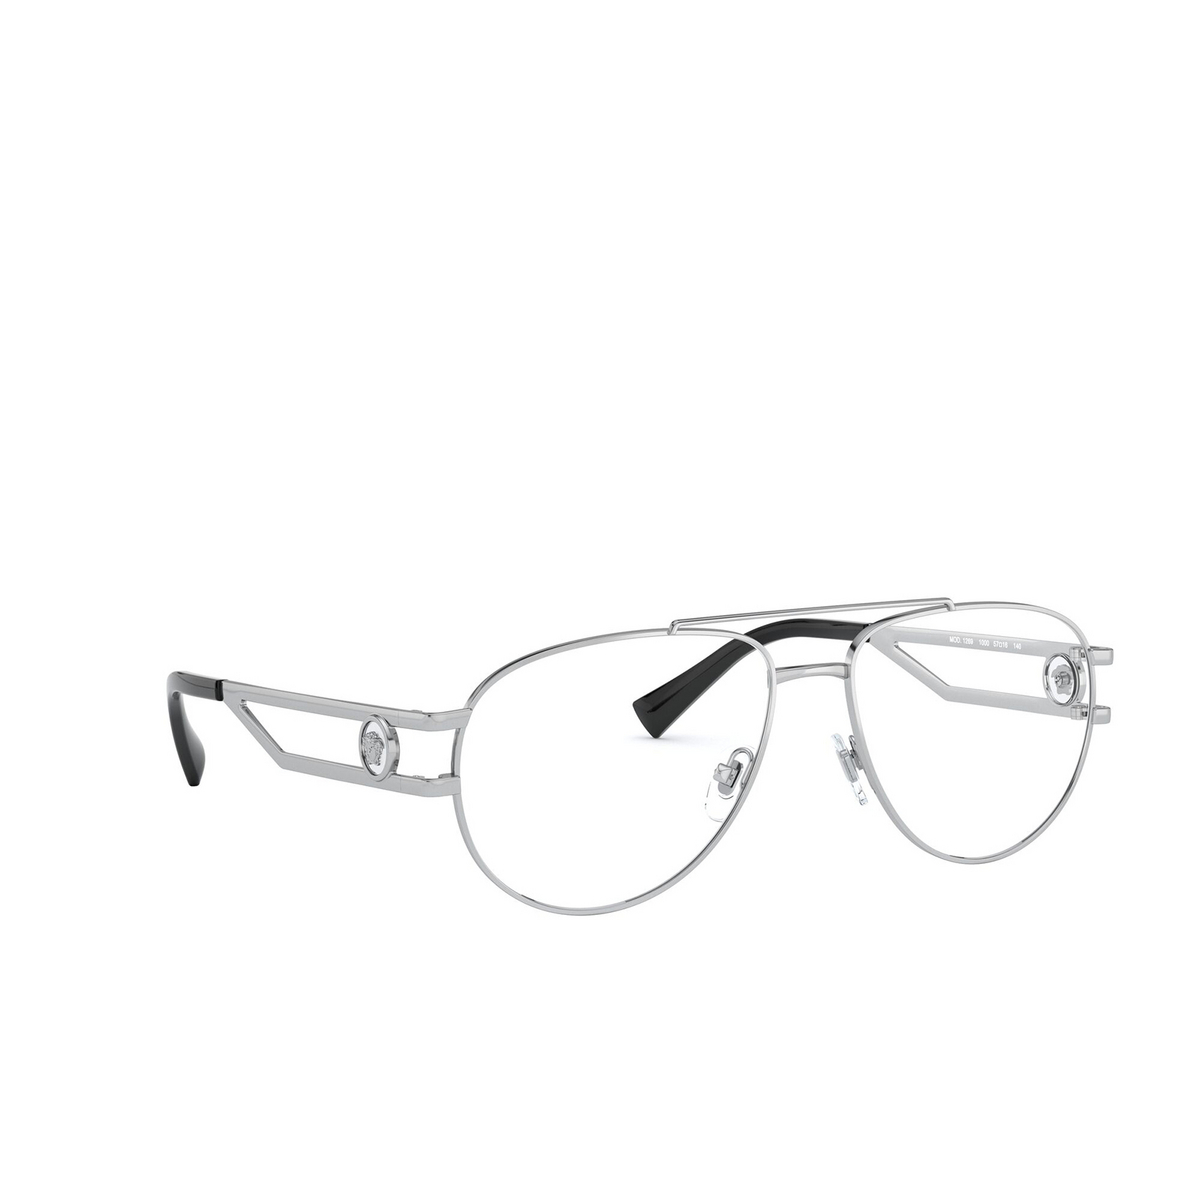 Versace® Aviator Eyeglasses: VE1269 color Silver 1000 - three-quarters view.